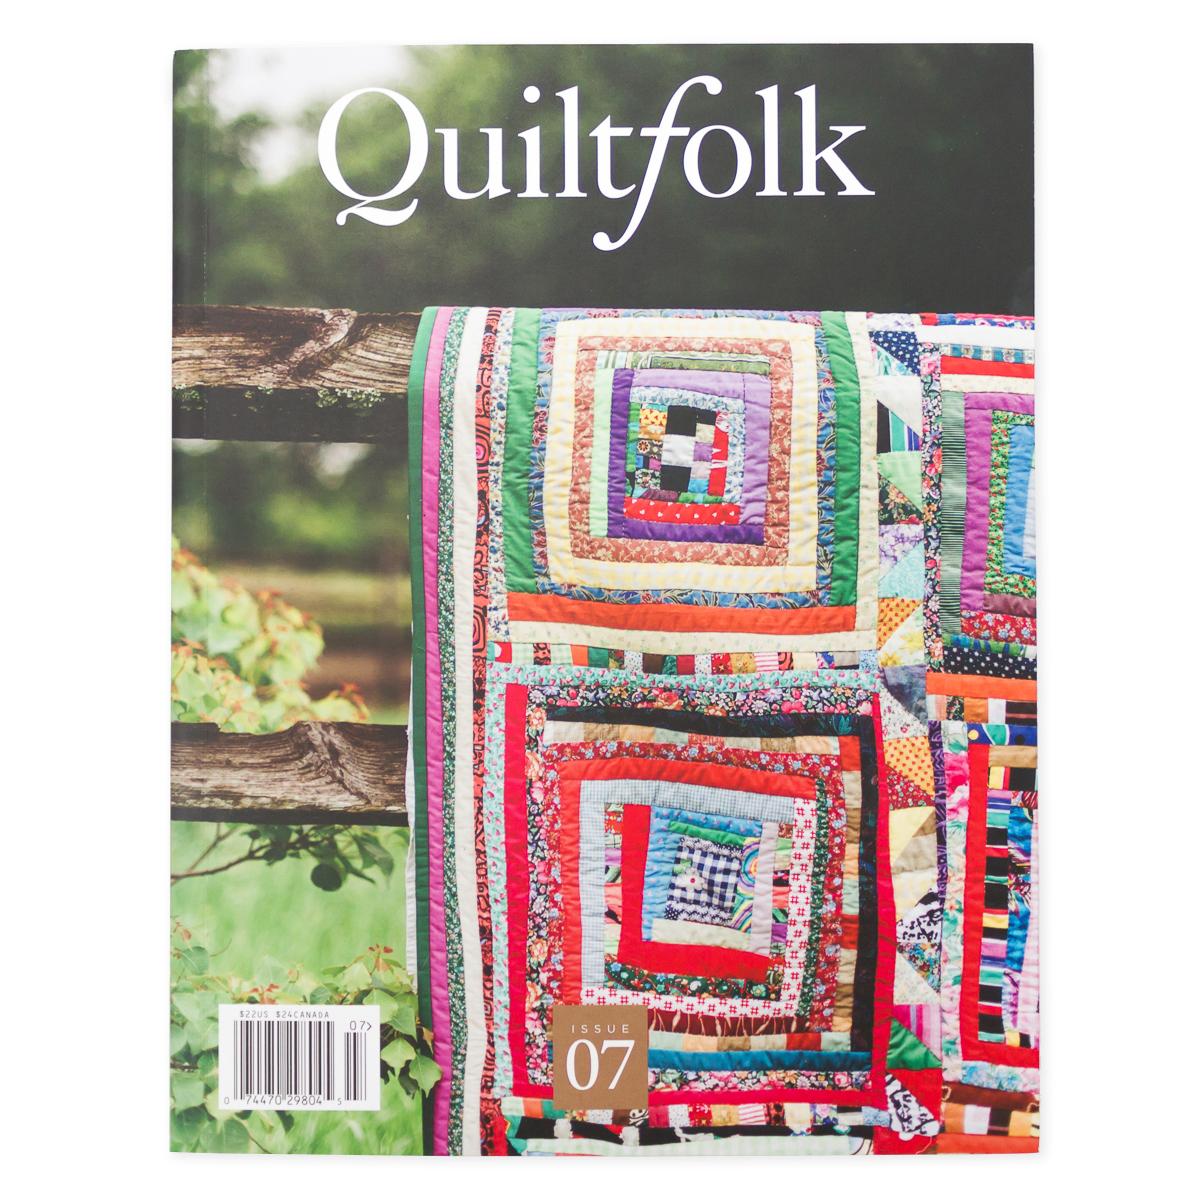 quiltfolk_magazine_Louisiana_1.jpg